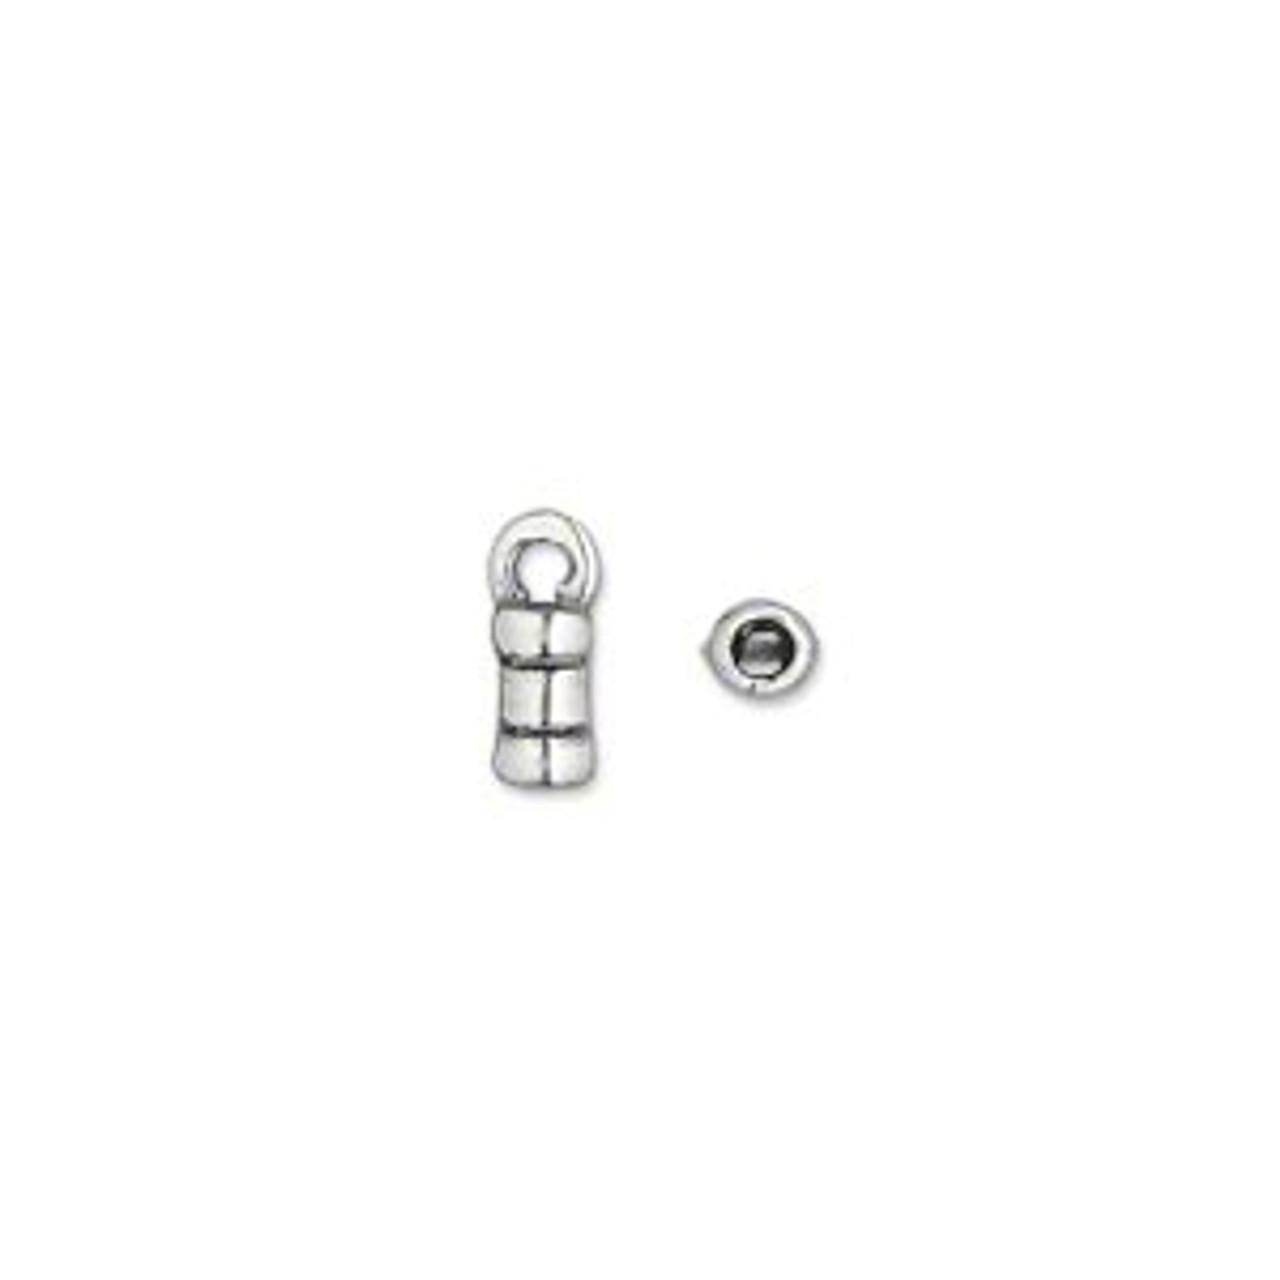 6mm Tube & 5mm Ring End (6 Pack)